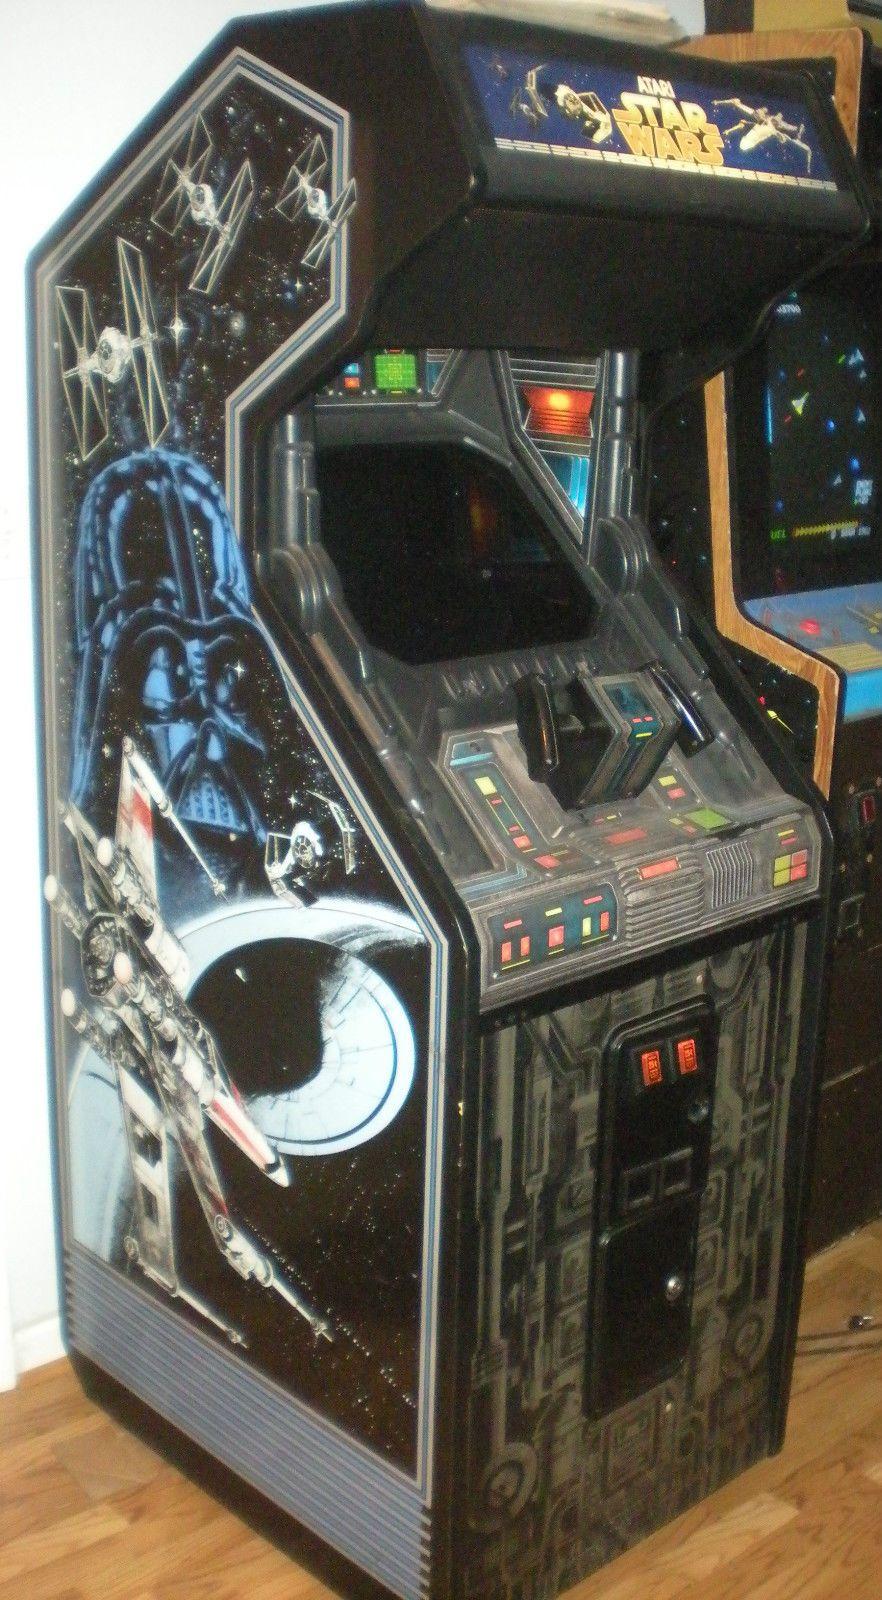 Star Wars Atari 1983 Dedicated Arcade Machine AWESOME